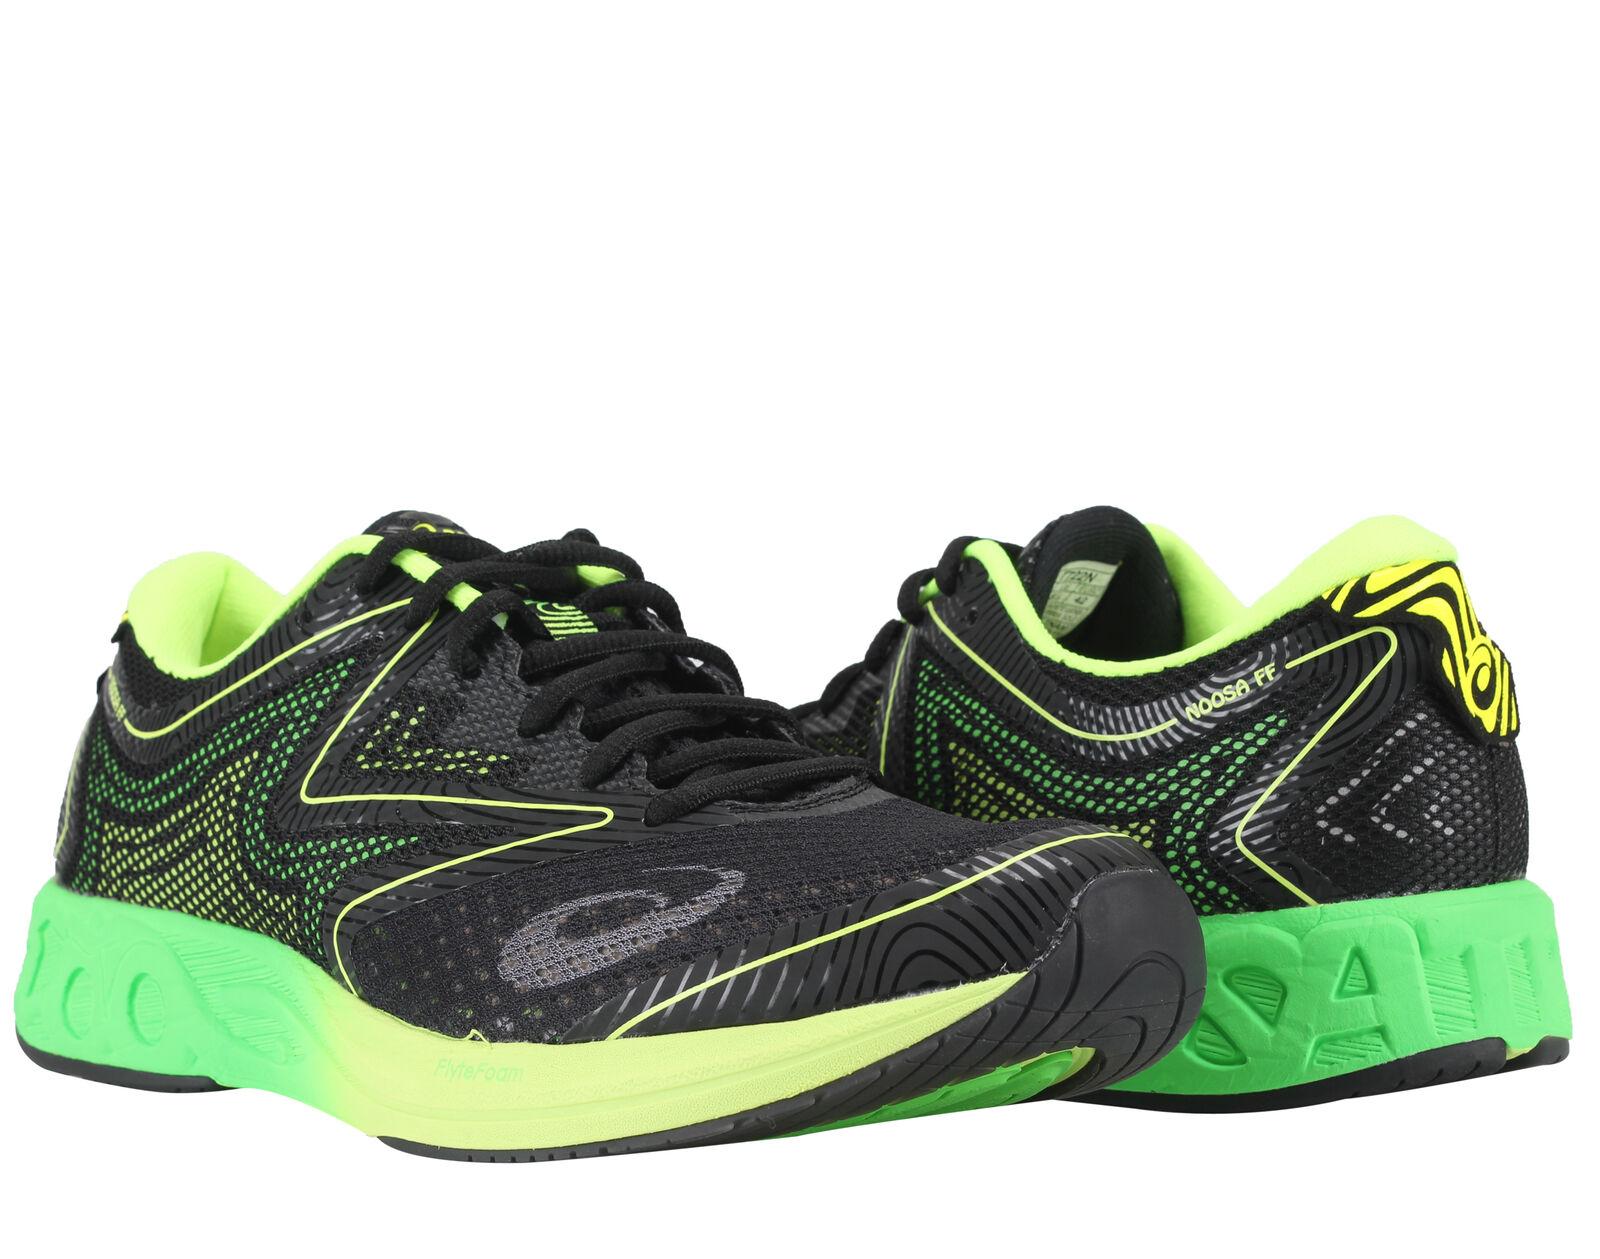 Asics Noosa FF Noir/Vert Gecko/Safety Jaune Homme Running Chaussures T722N-9085